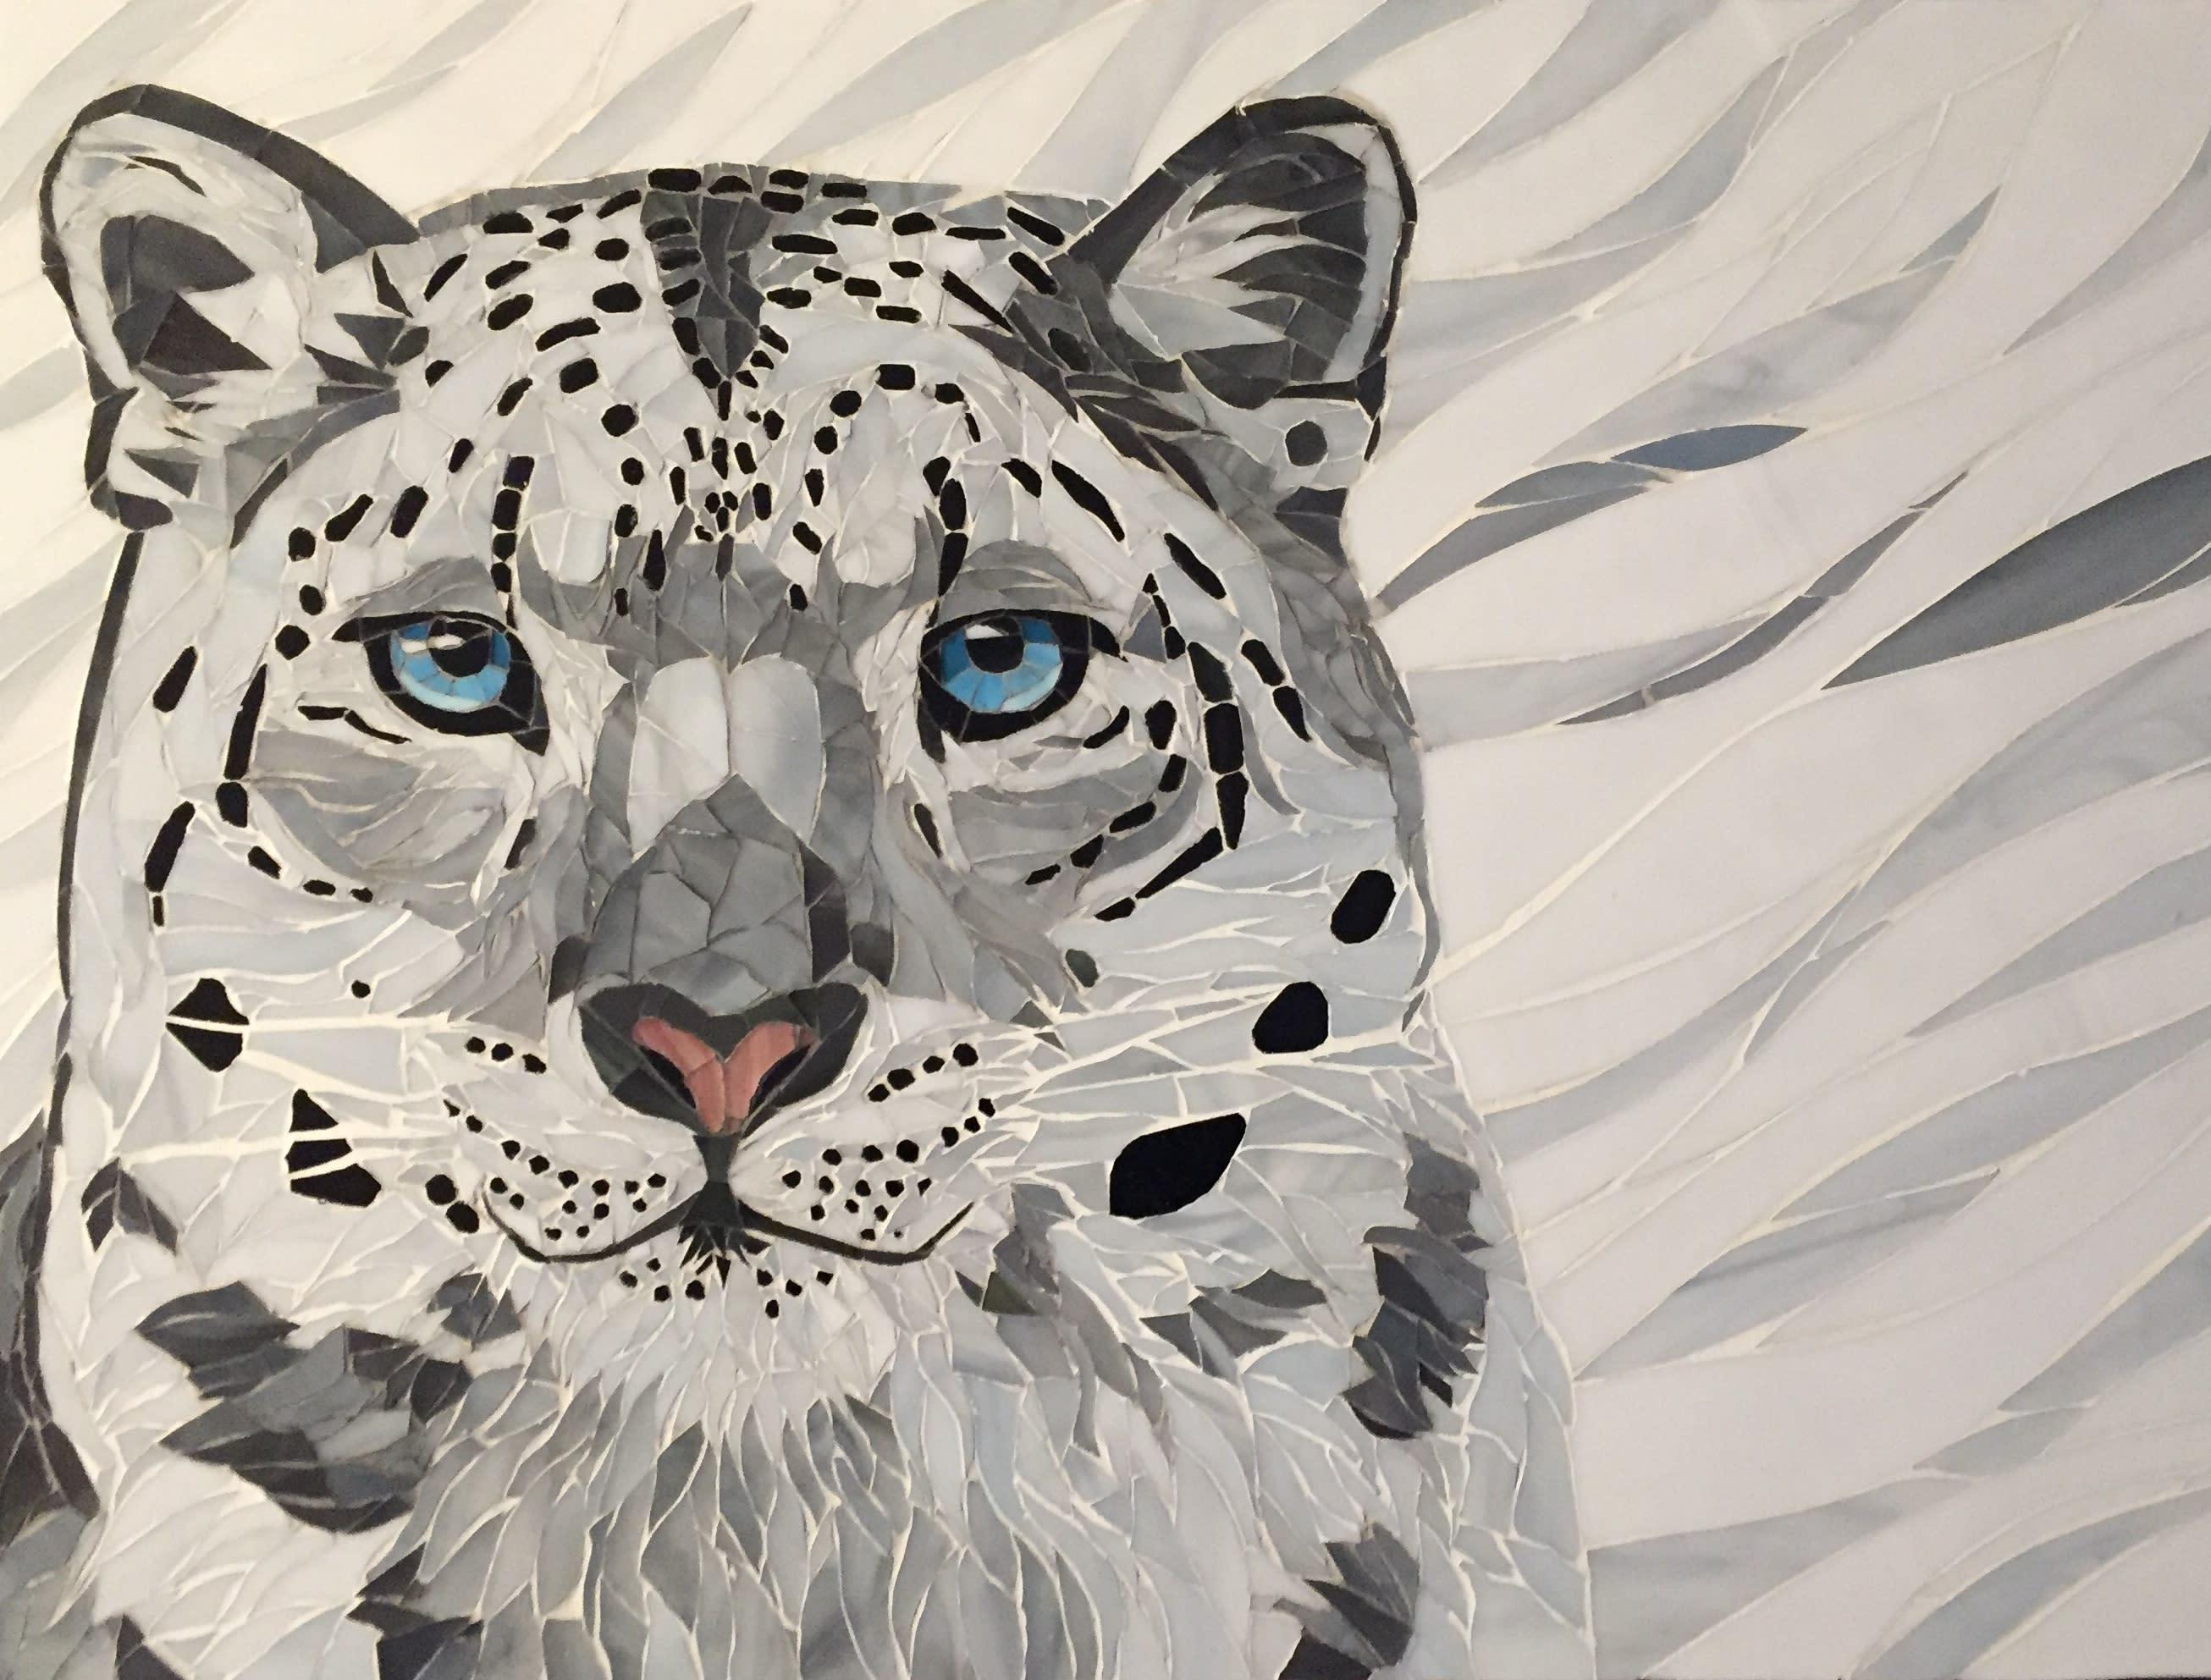 Snow leopard vjggkq